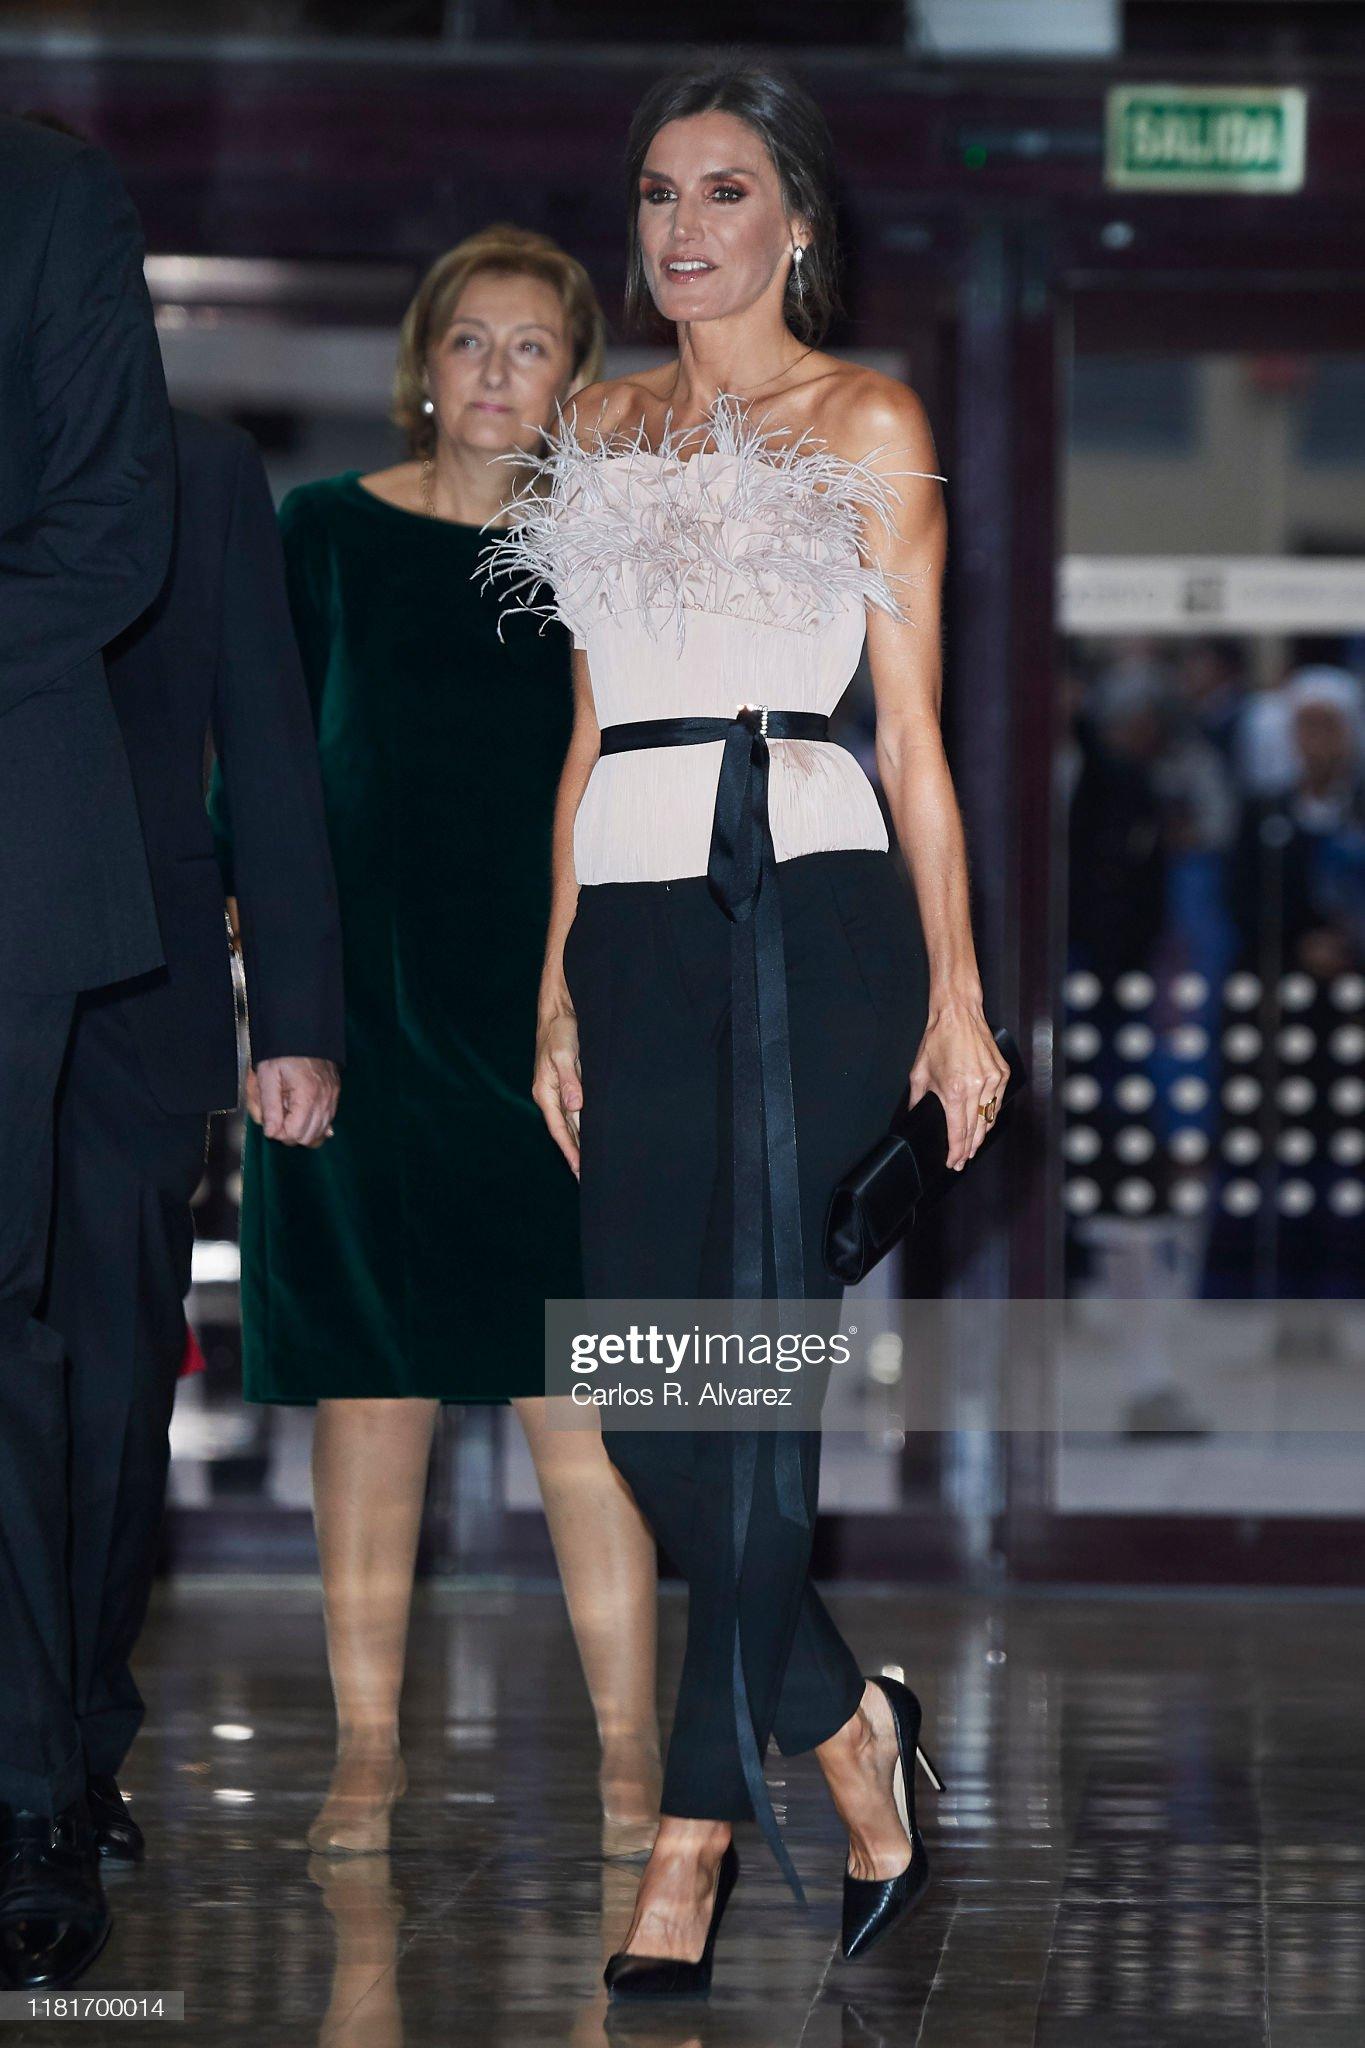 Spanish Royals Attend Princess of Asturias Awards Concert 2019 : News Photo